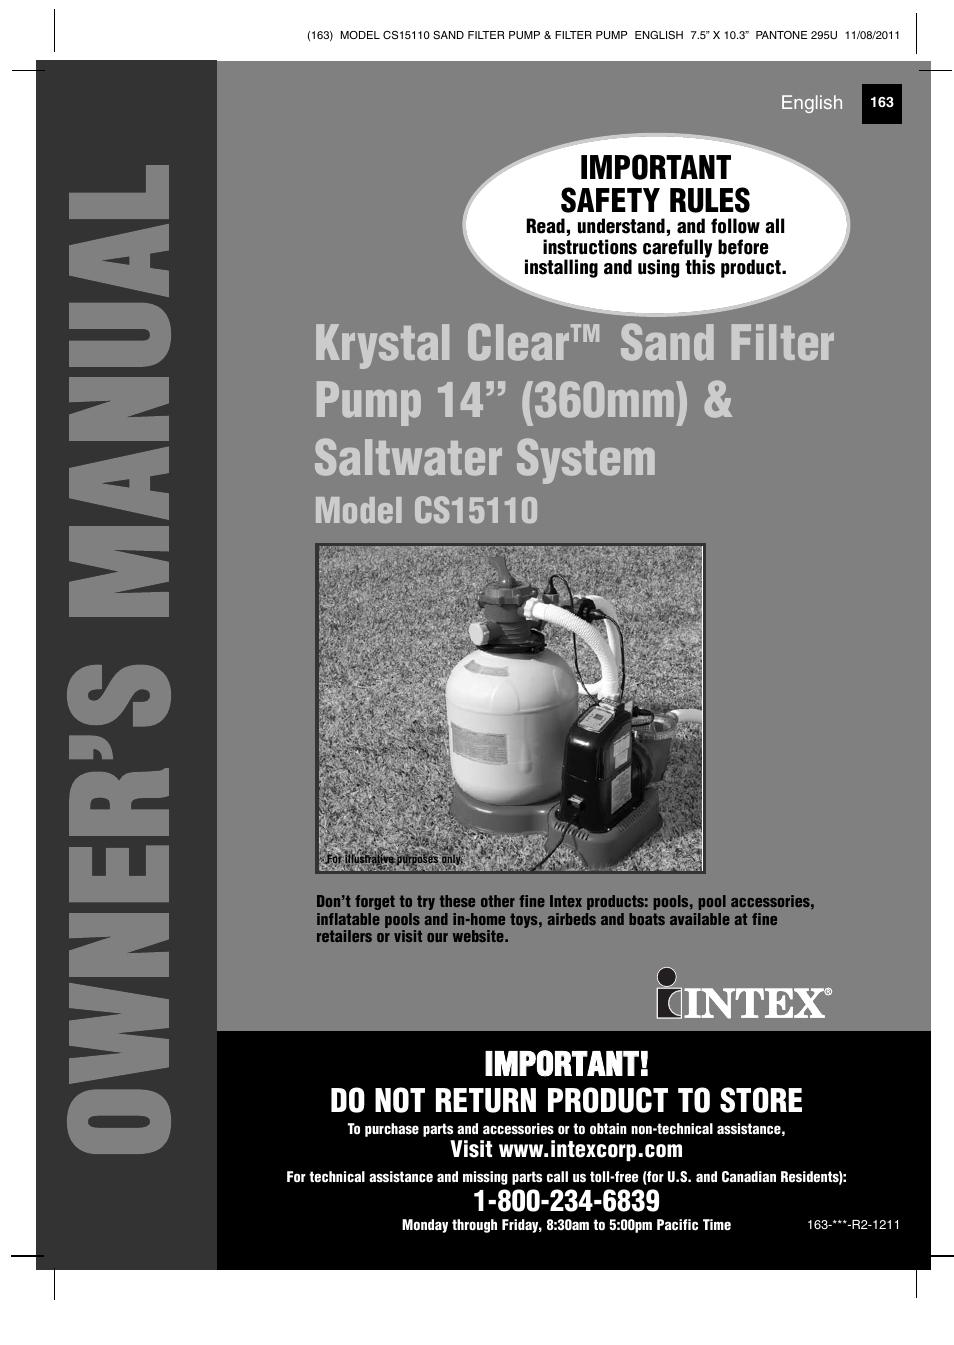 Intex Cs15110 Krystal Clear 2012 User Manual 40 Pages